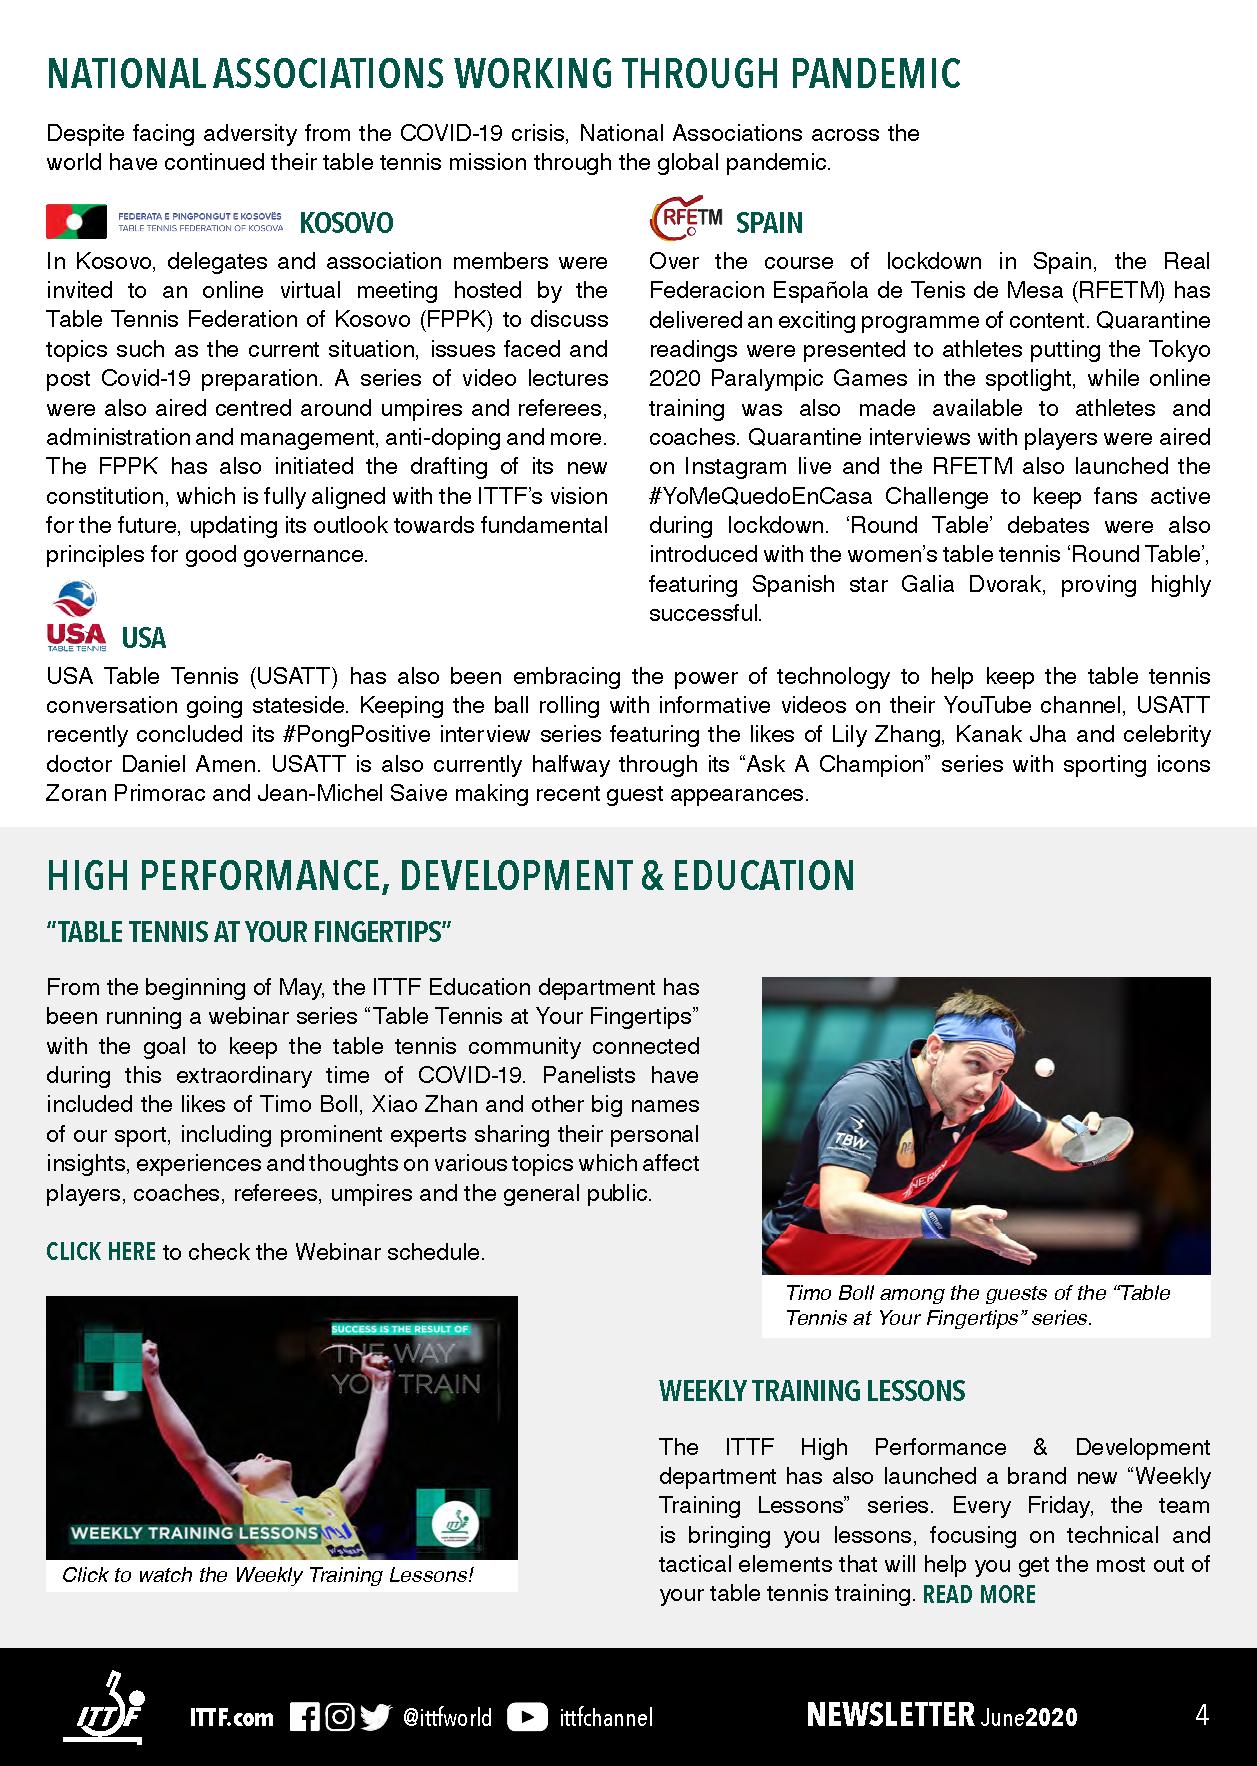 ITTF_Newsletter_04_JUN-2020_Page_4